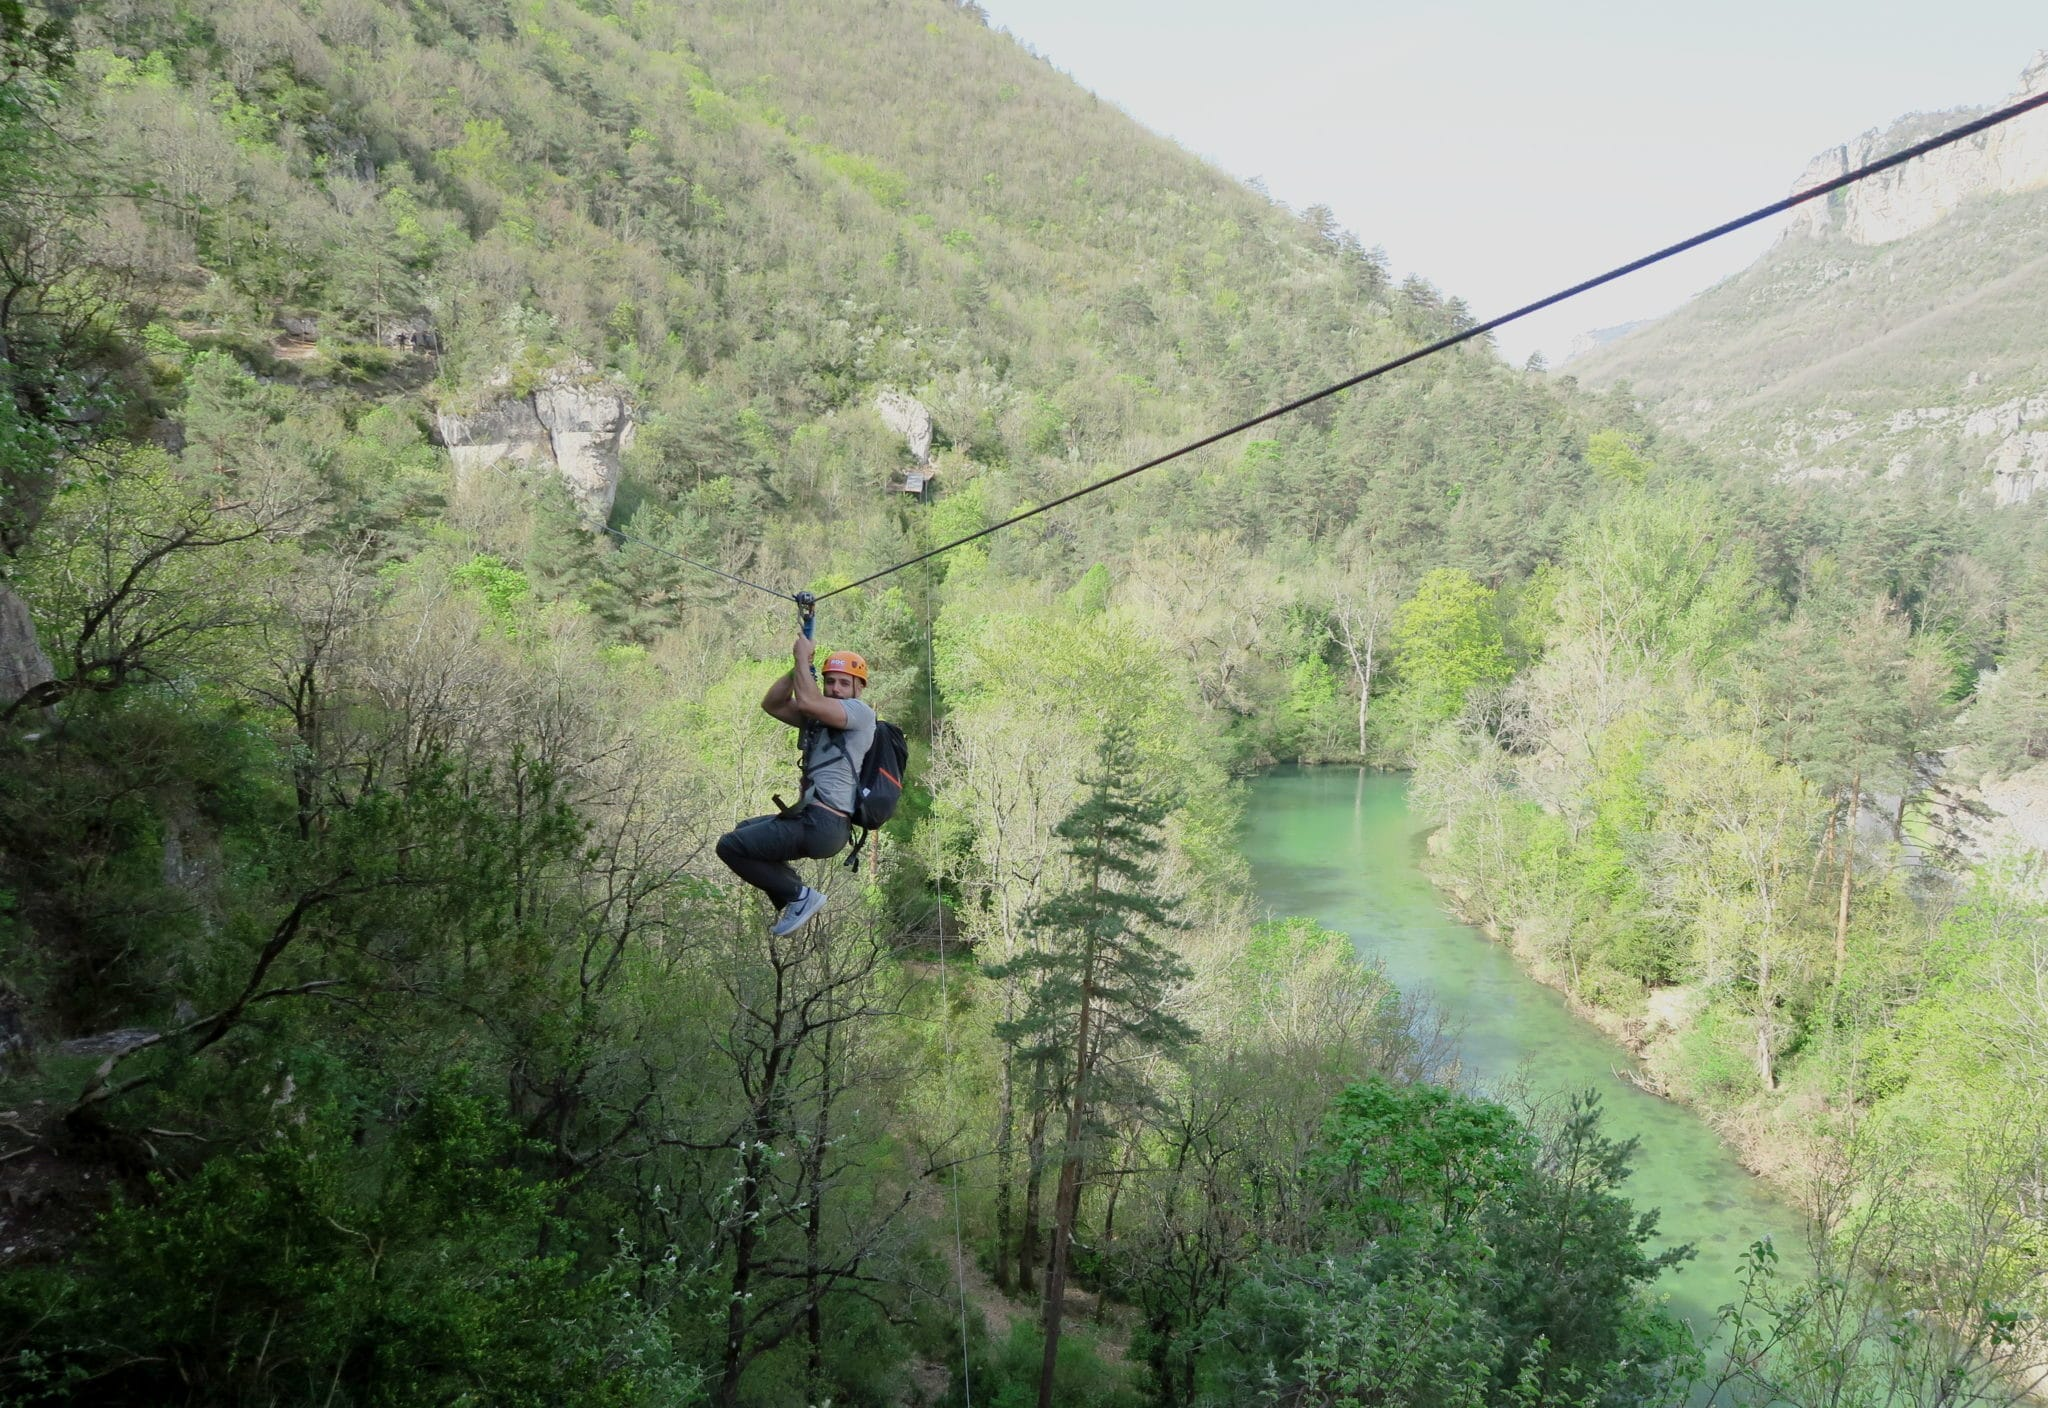 Zip-line Dourbie Gorges Aveyron France